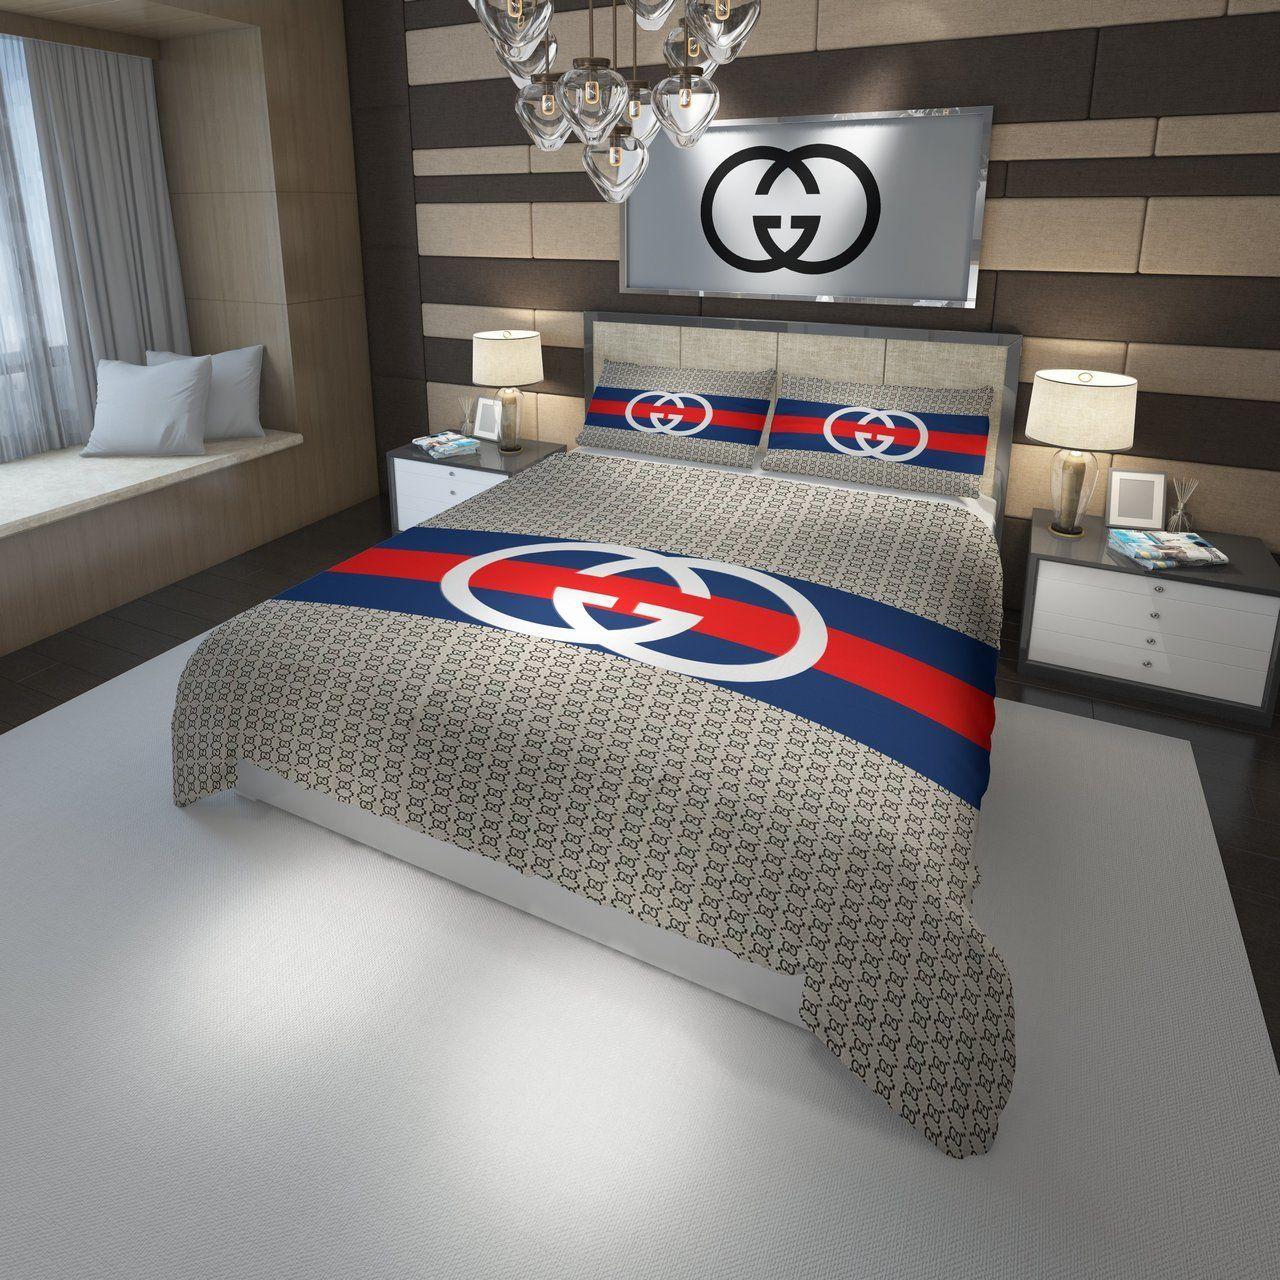 Gucci Logo Custom 1 3D Customized Bedding Sets Duvet